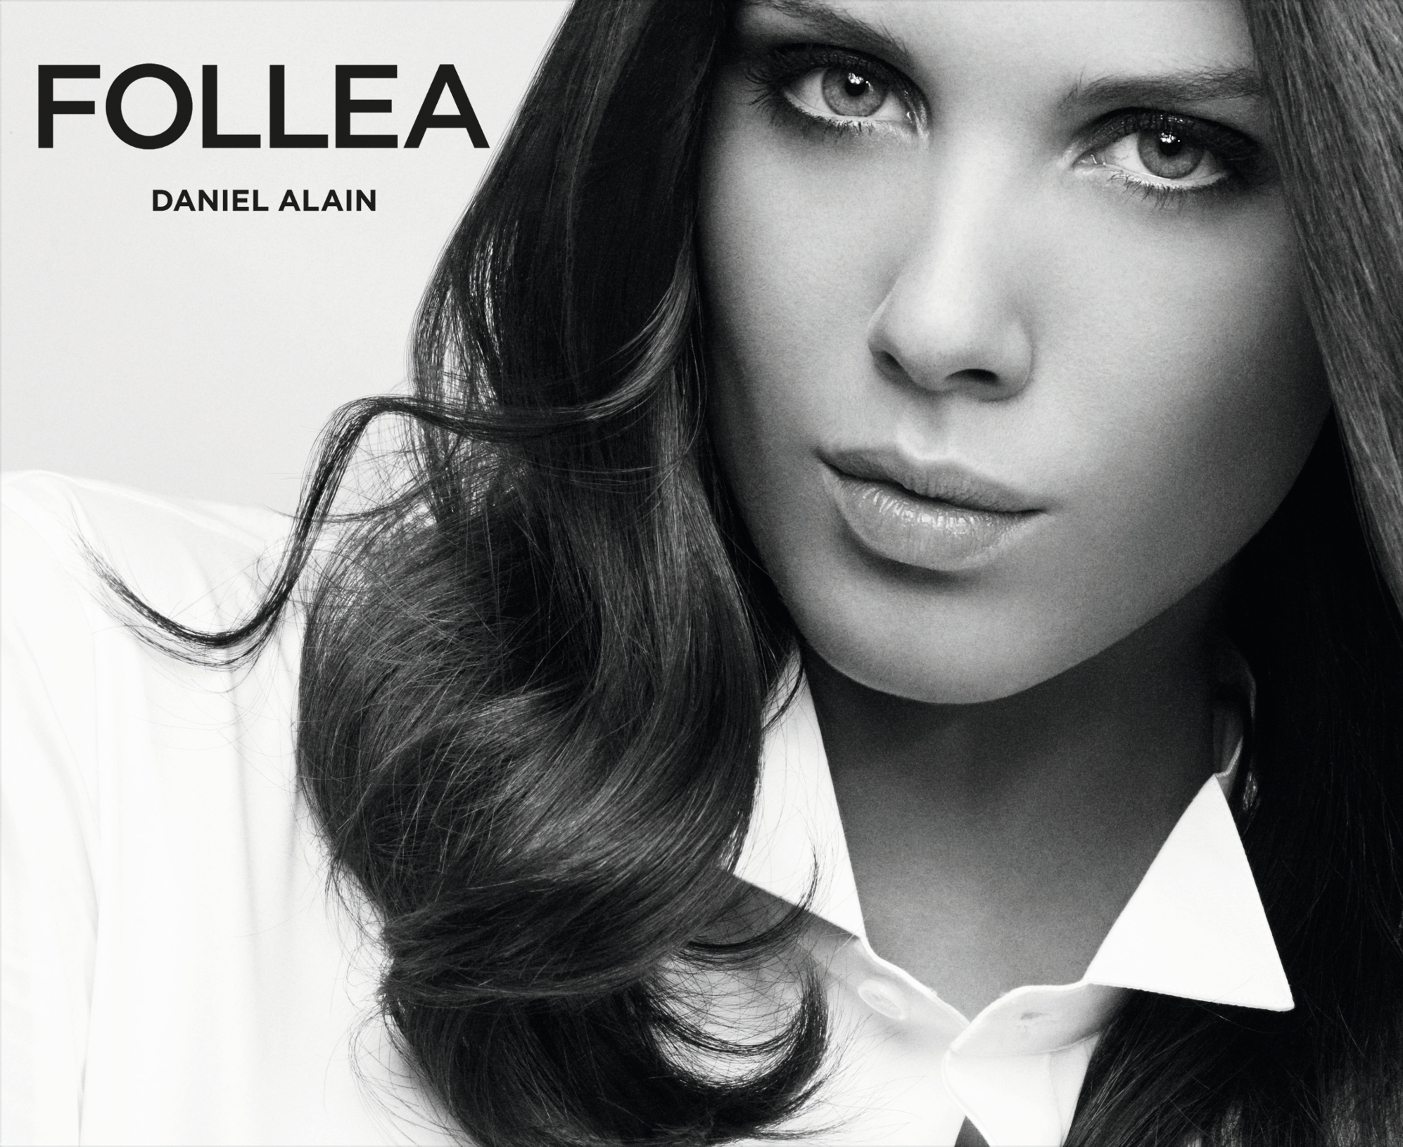 Follea style wig blog post by aspire ahir